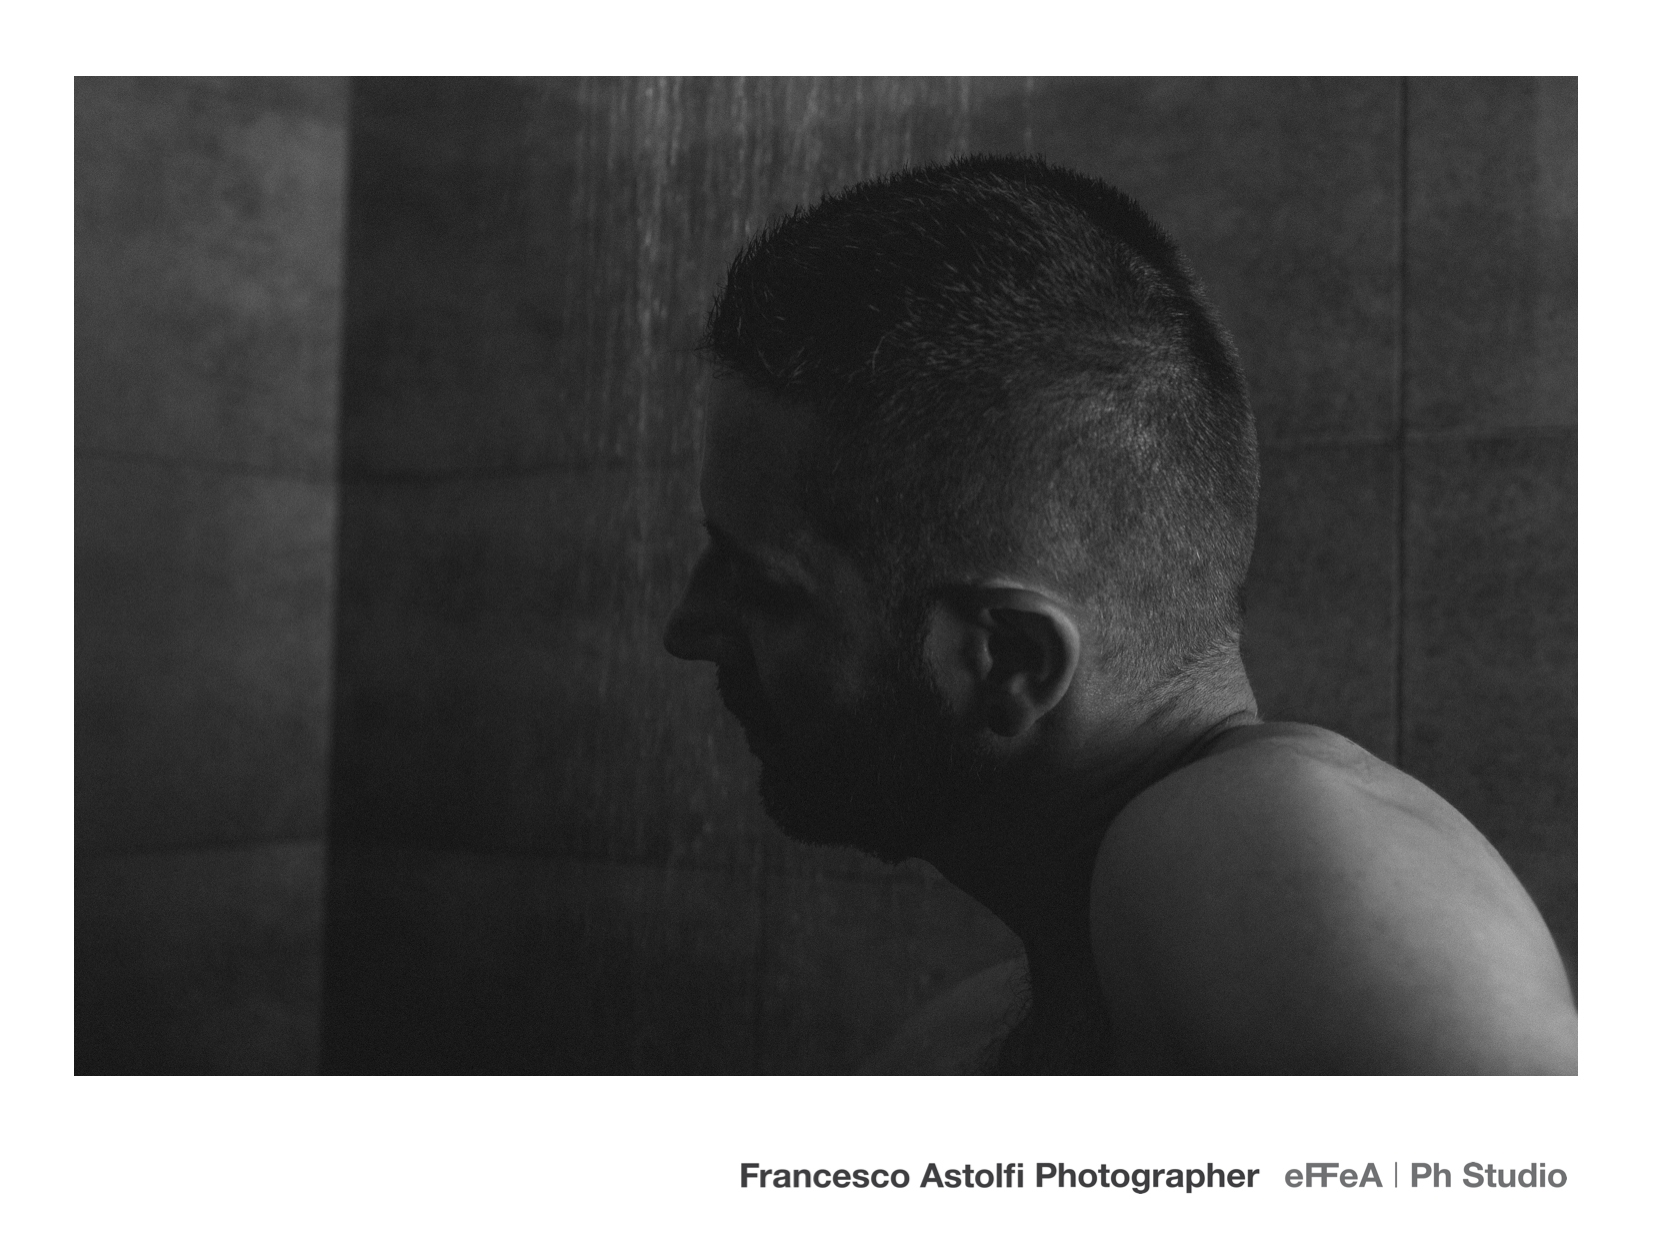 004 - ANDREA S. - Photo by Francesco Astolfi